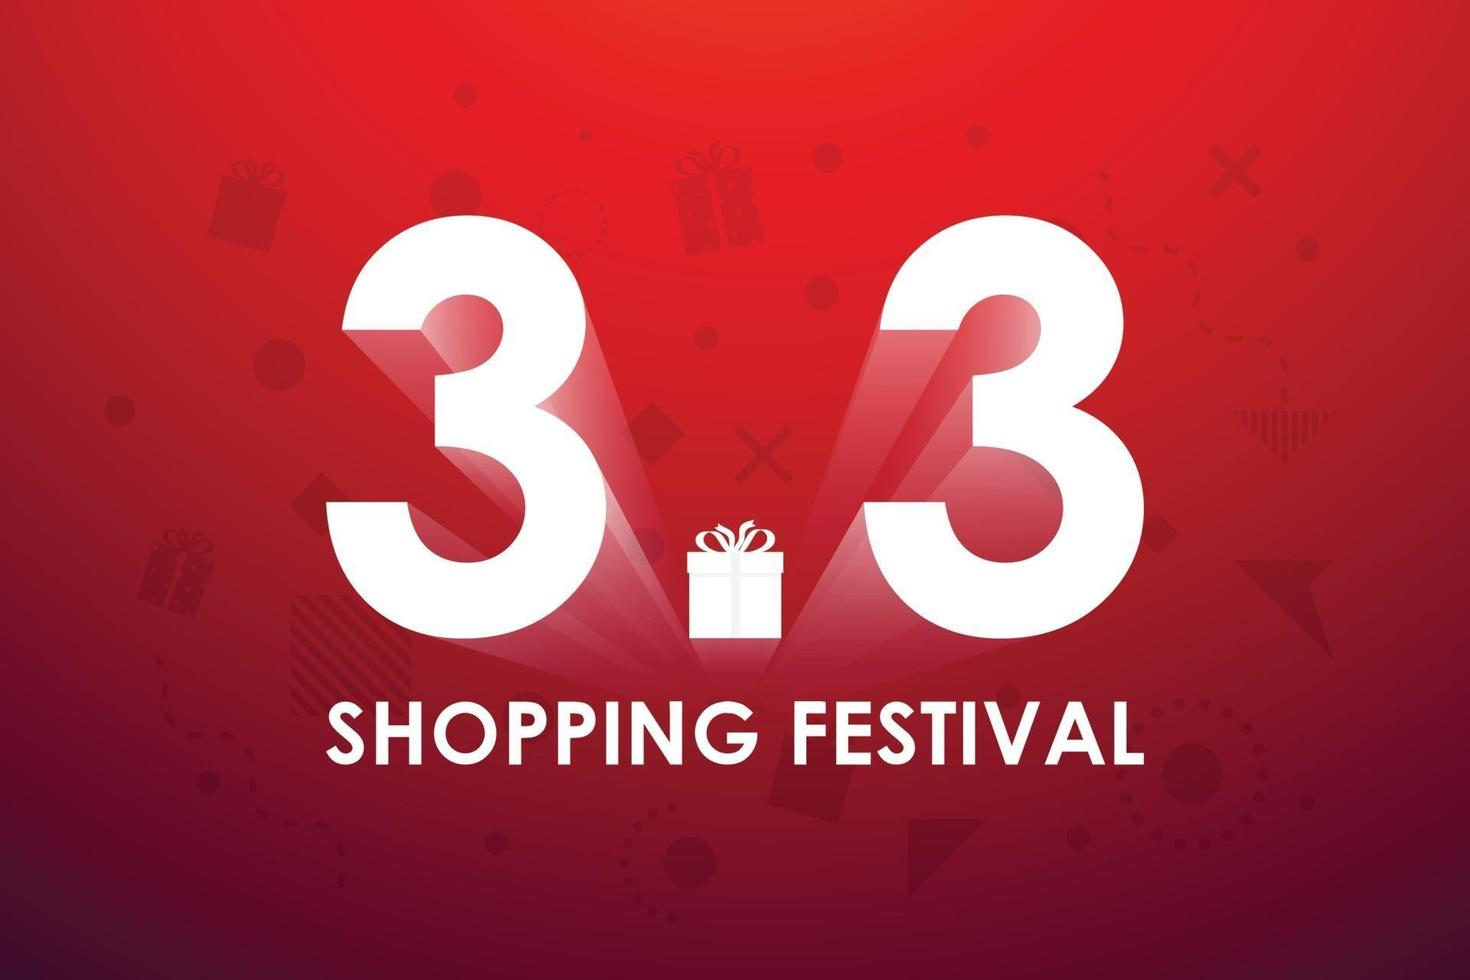 3.3 shopping festival, toespraak marketing bannerontwerp op rode achtergrond. vector illustratie